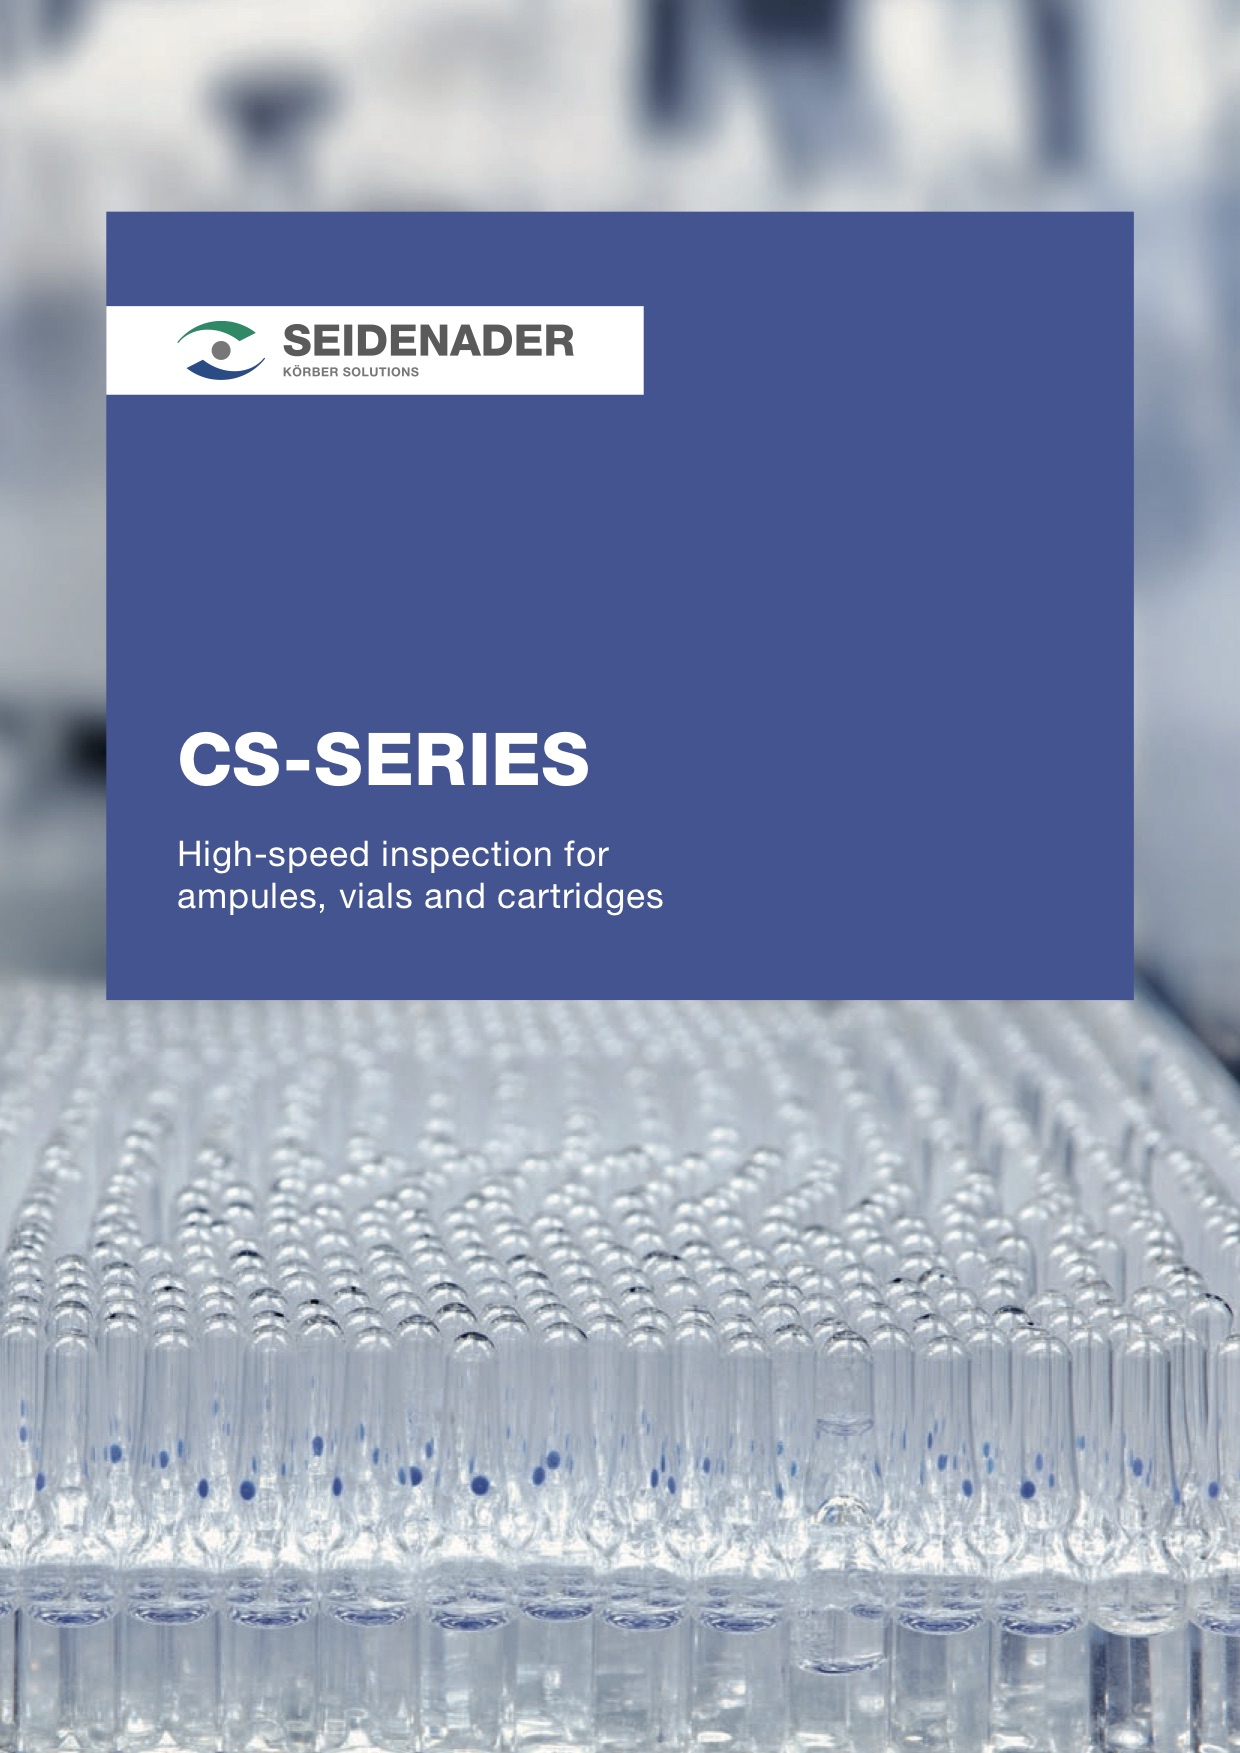 Seidenader_Automatic-Inspection_CS-Series_2018